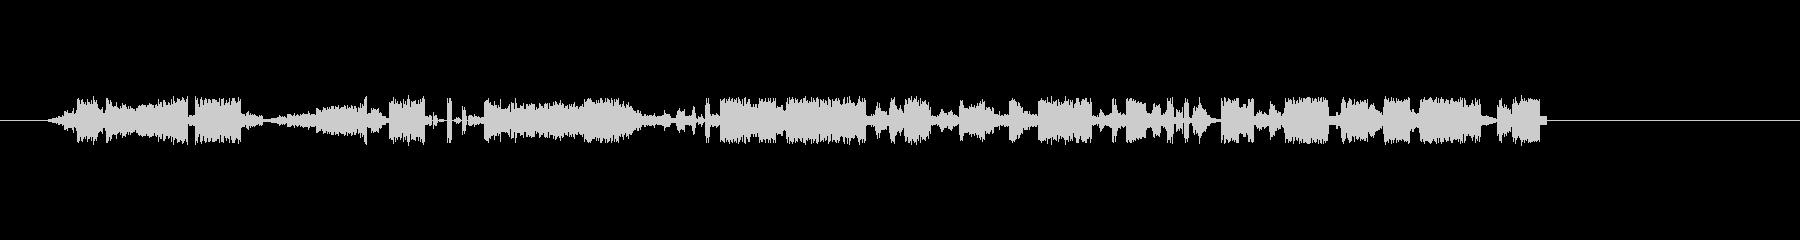 Radio Static 1 Sc...の未再生の波形